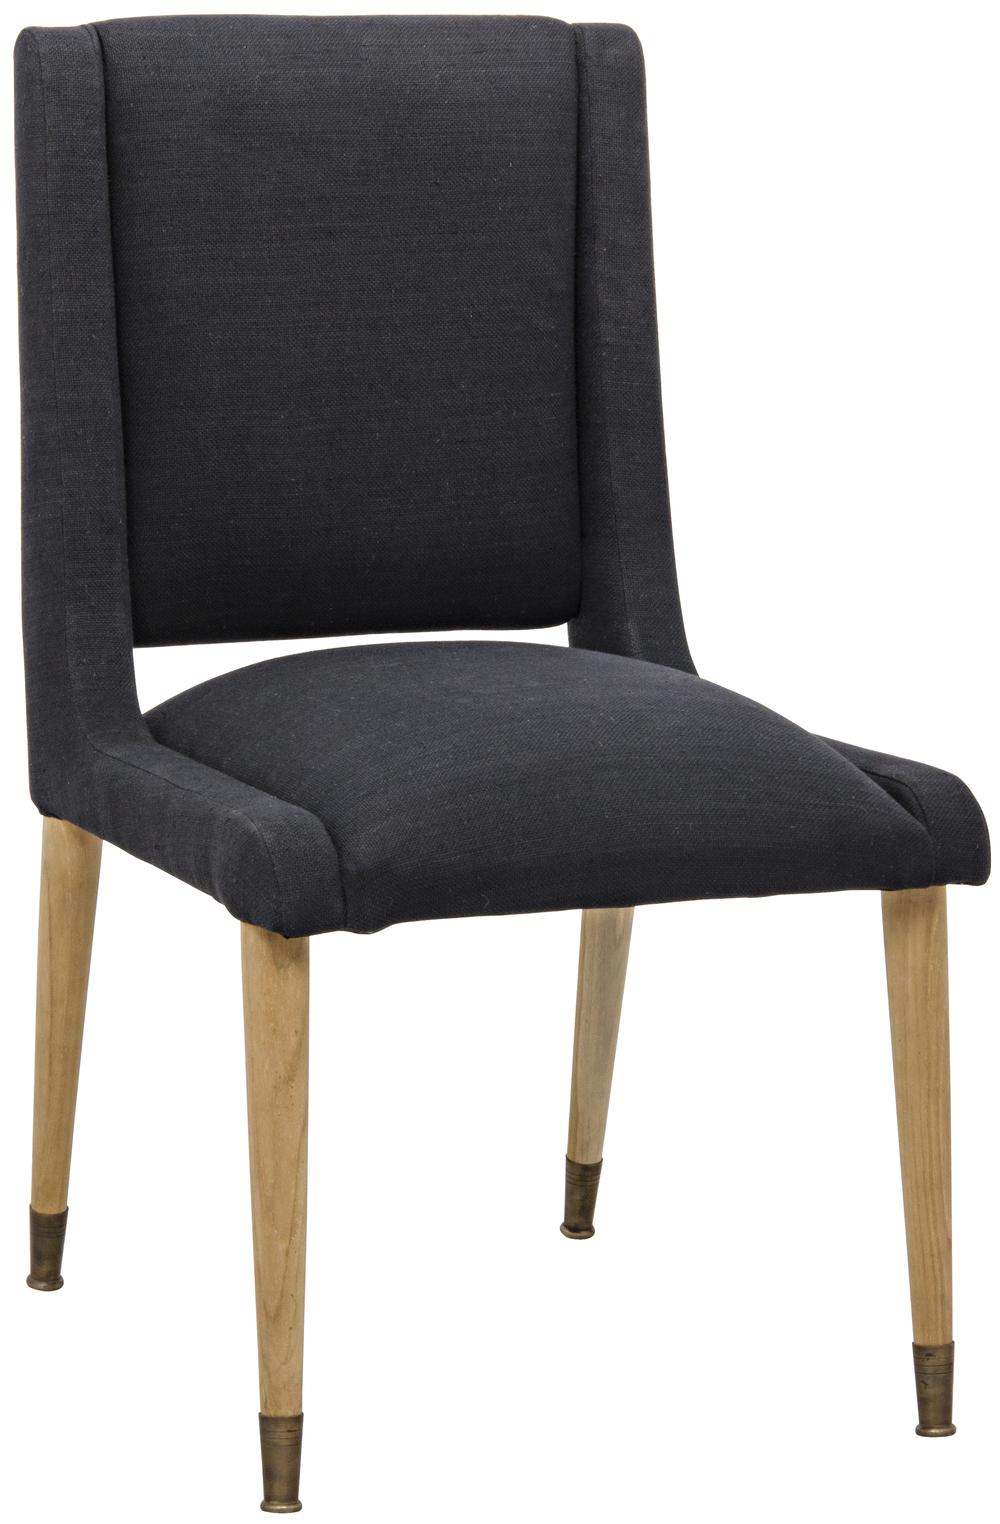 Noir Trading - Lino Dining Chair